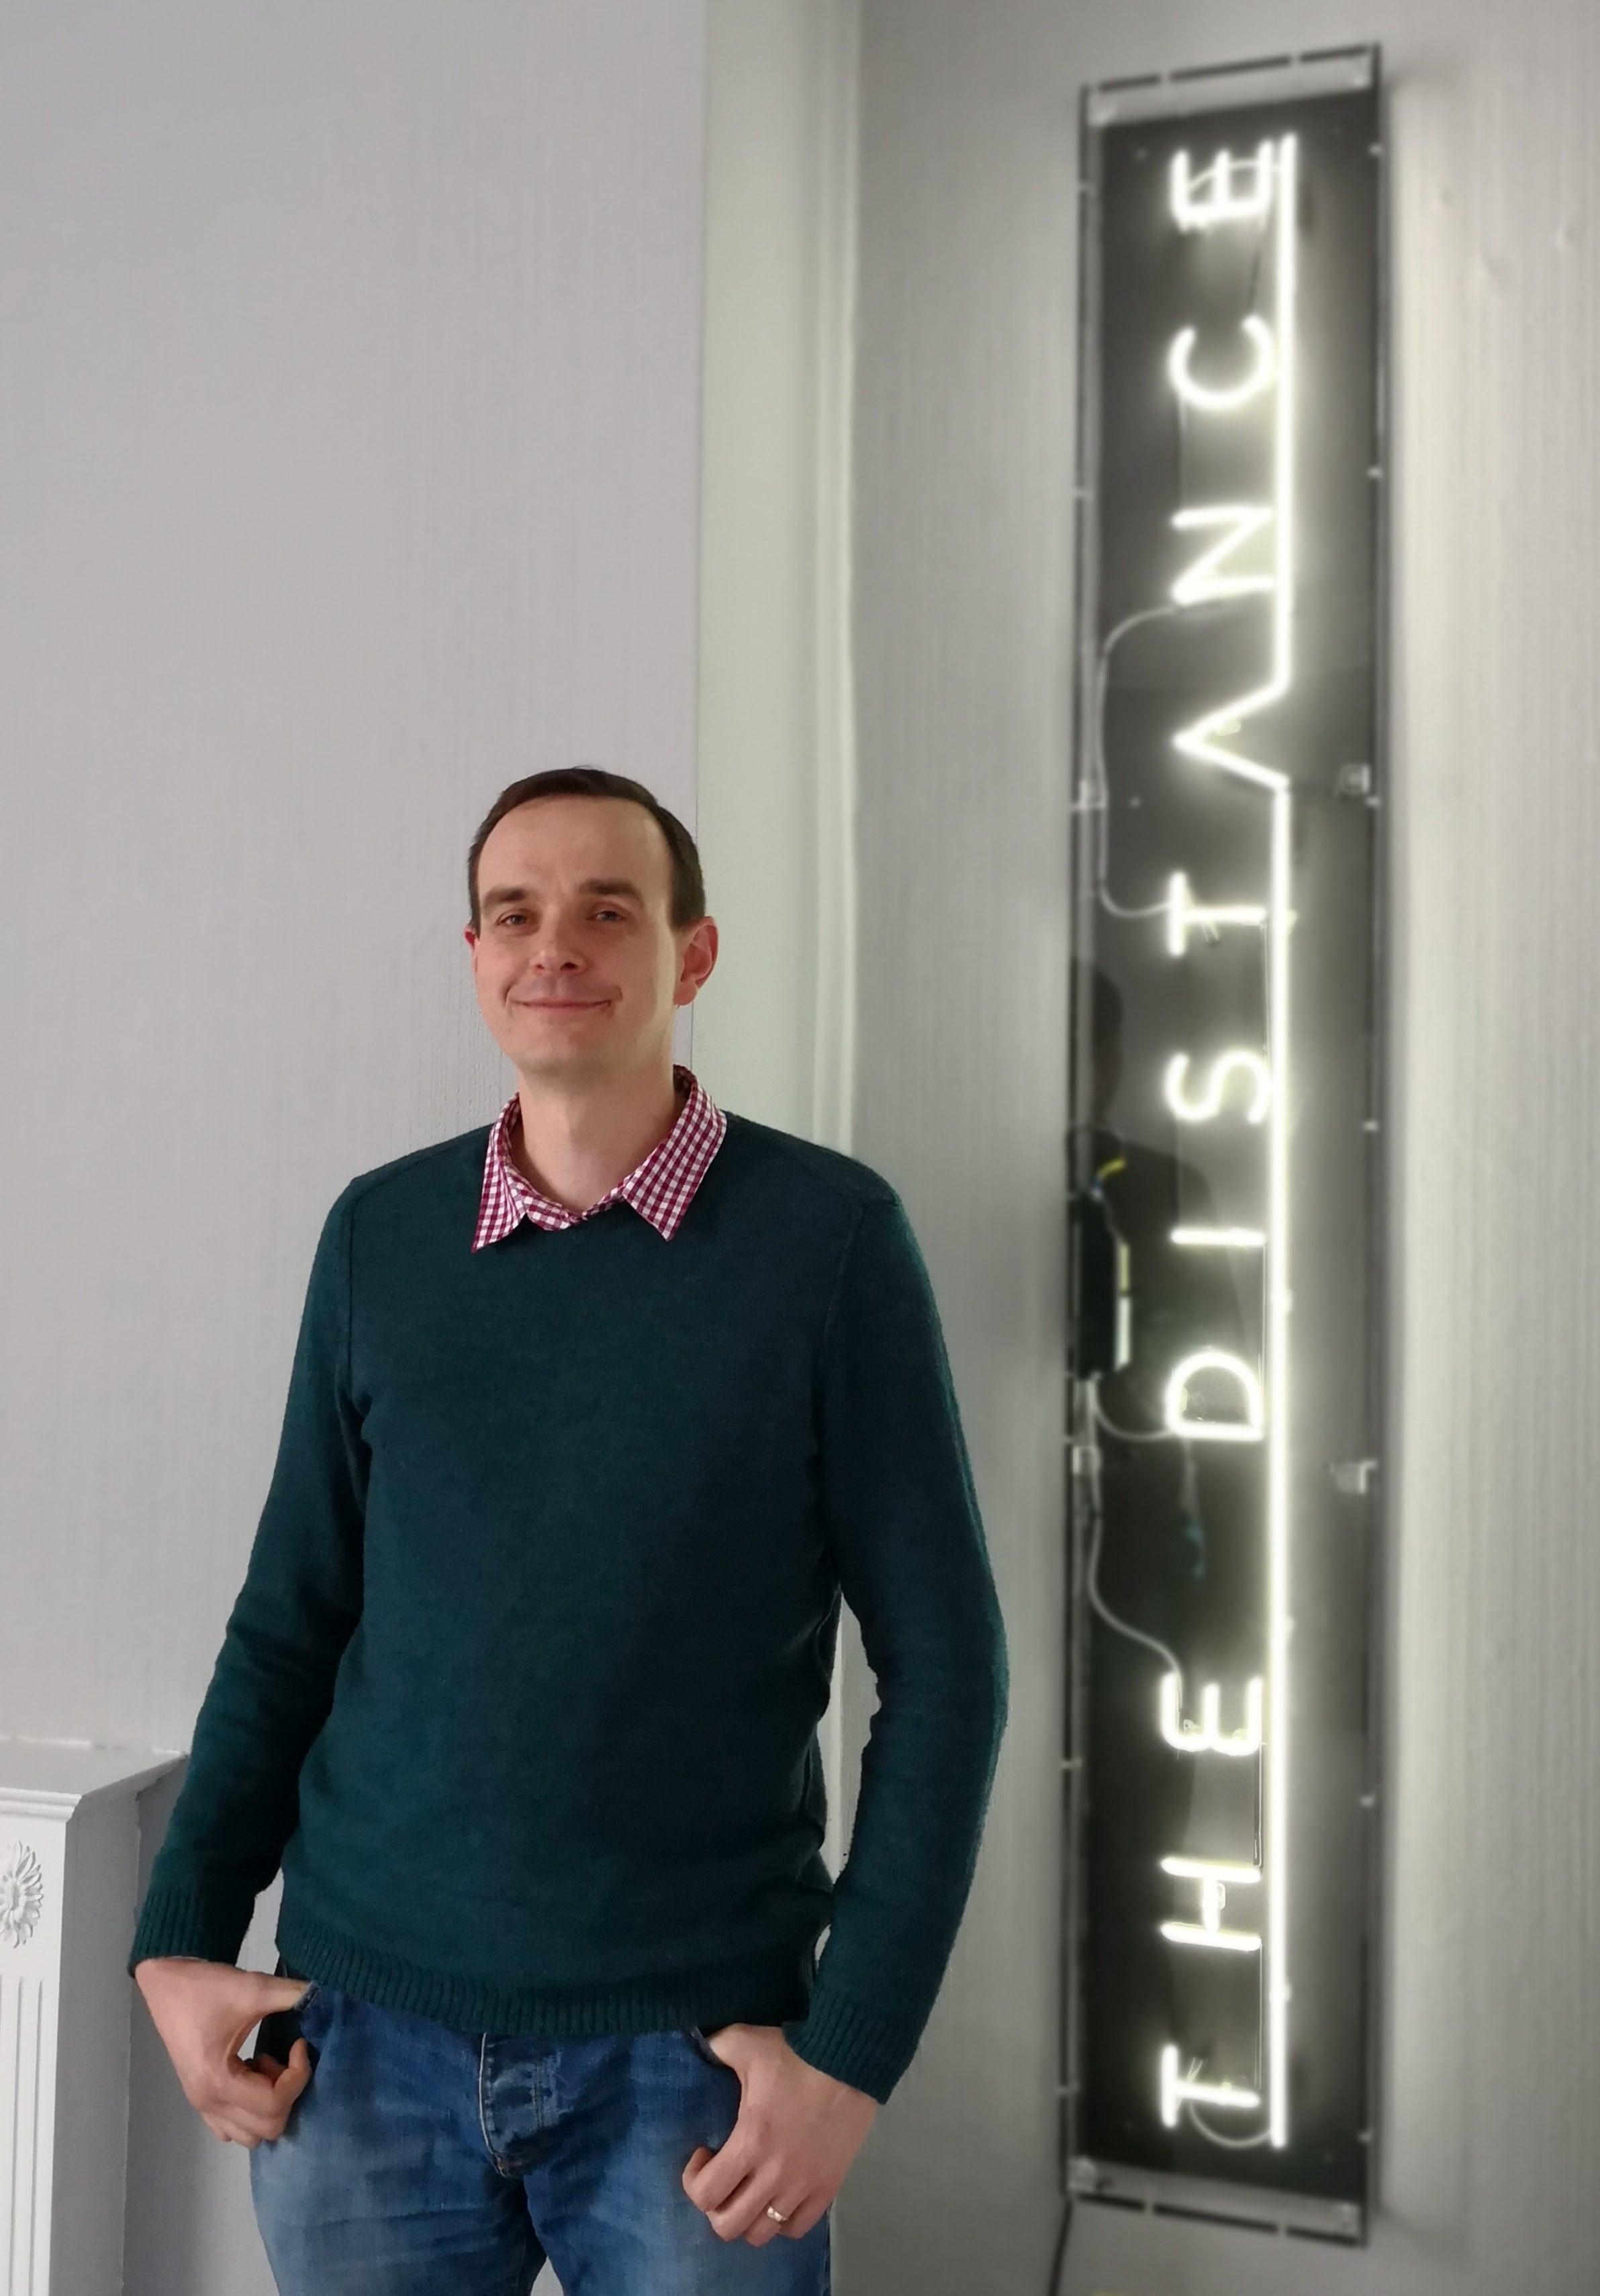 Press Release: SlashData's Technology Lead goes The Distance